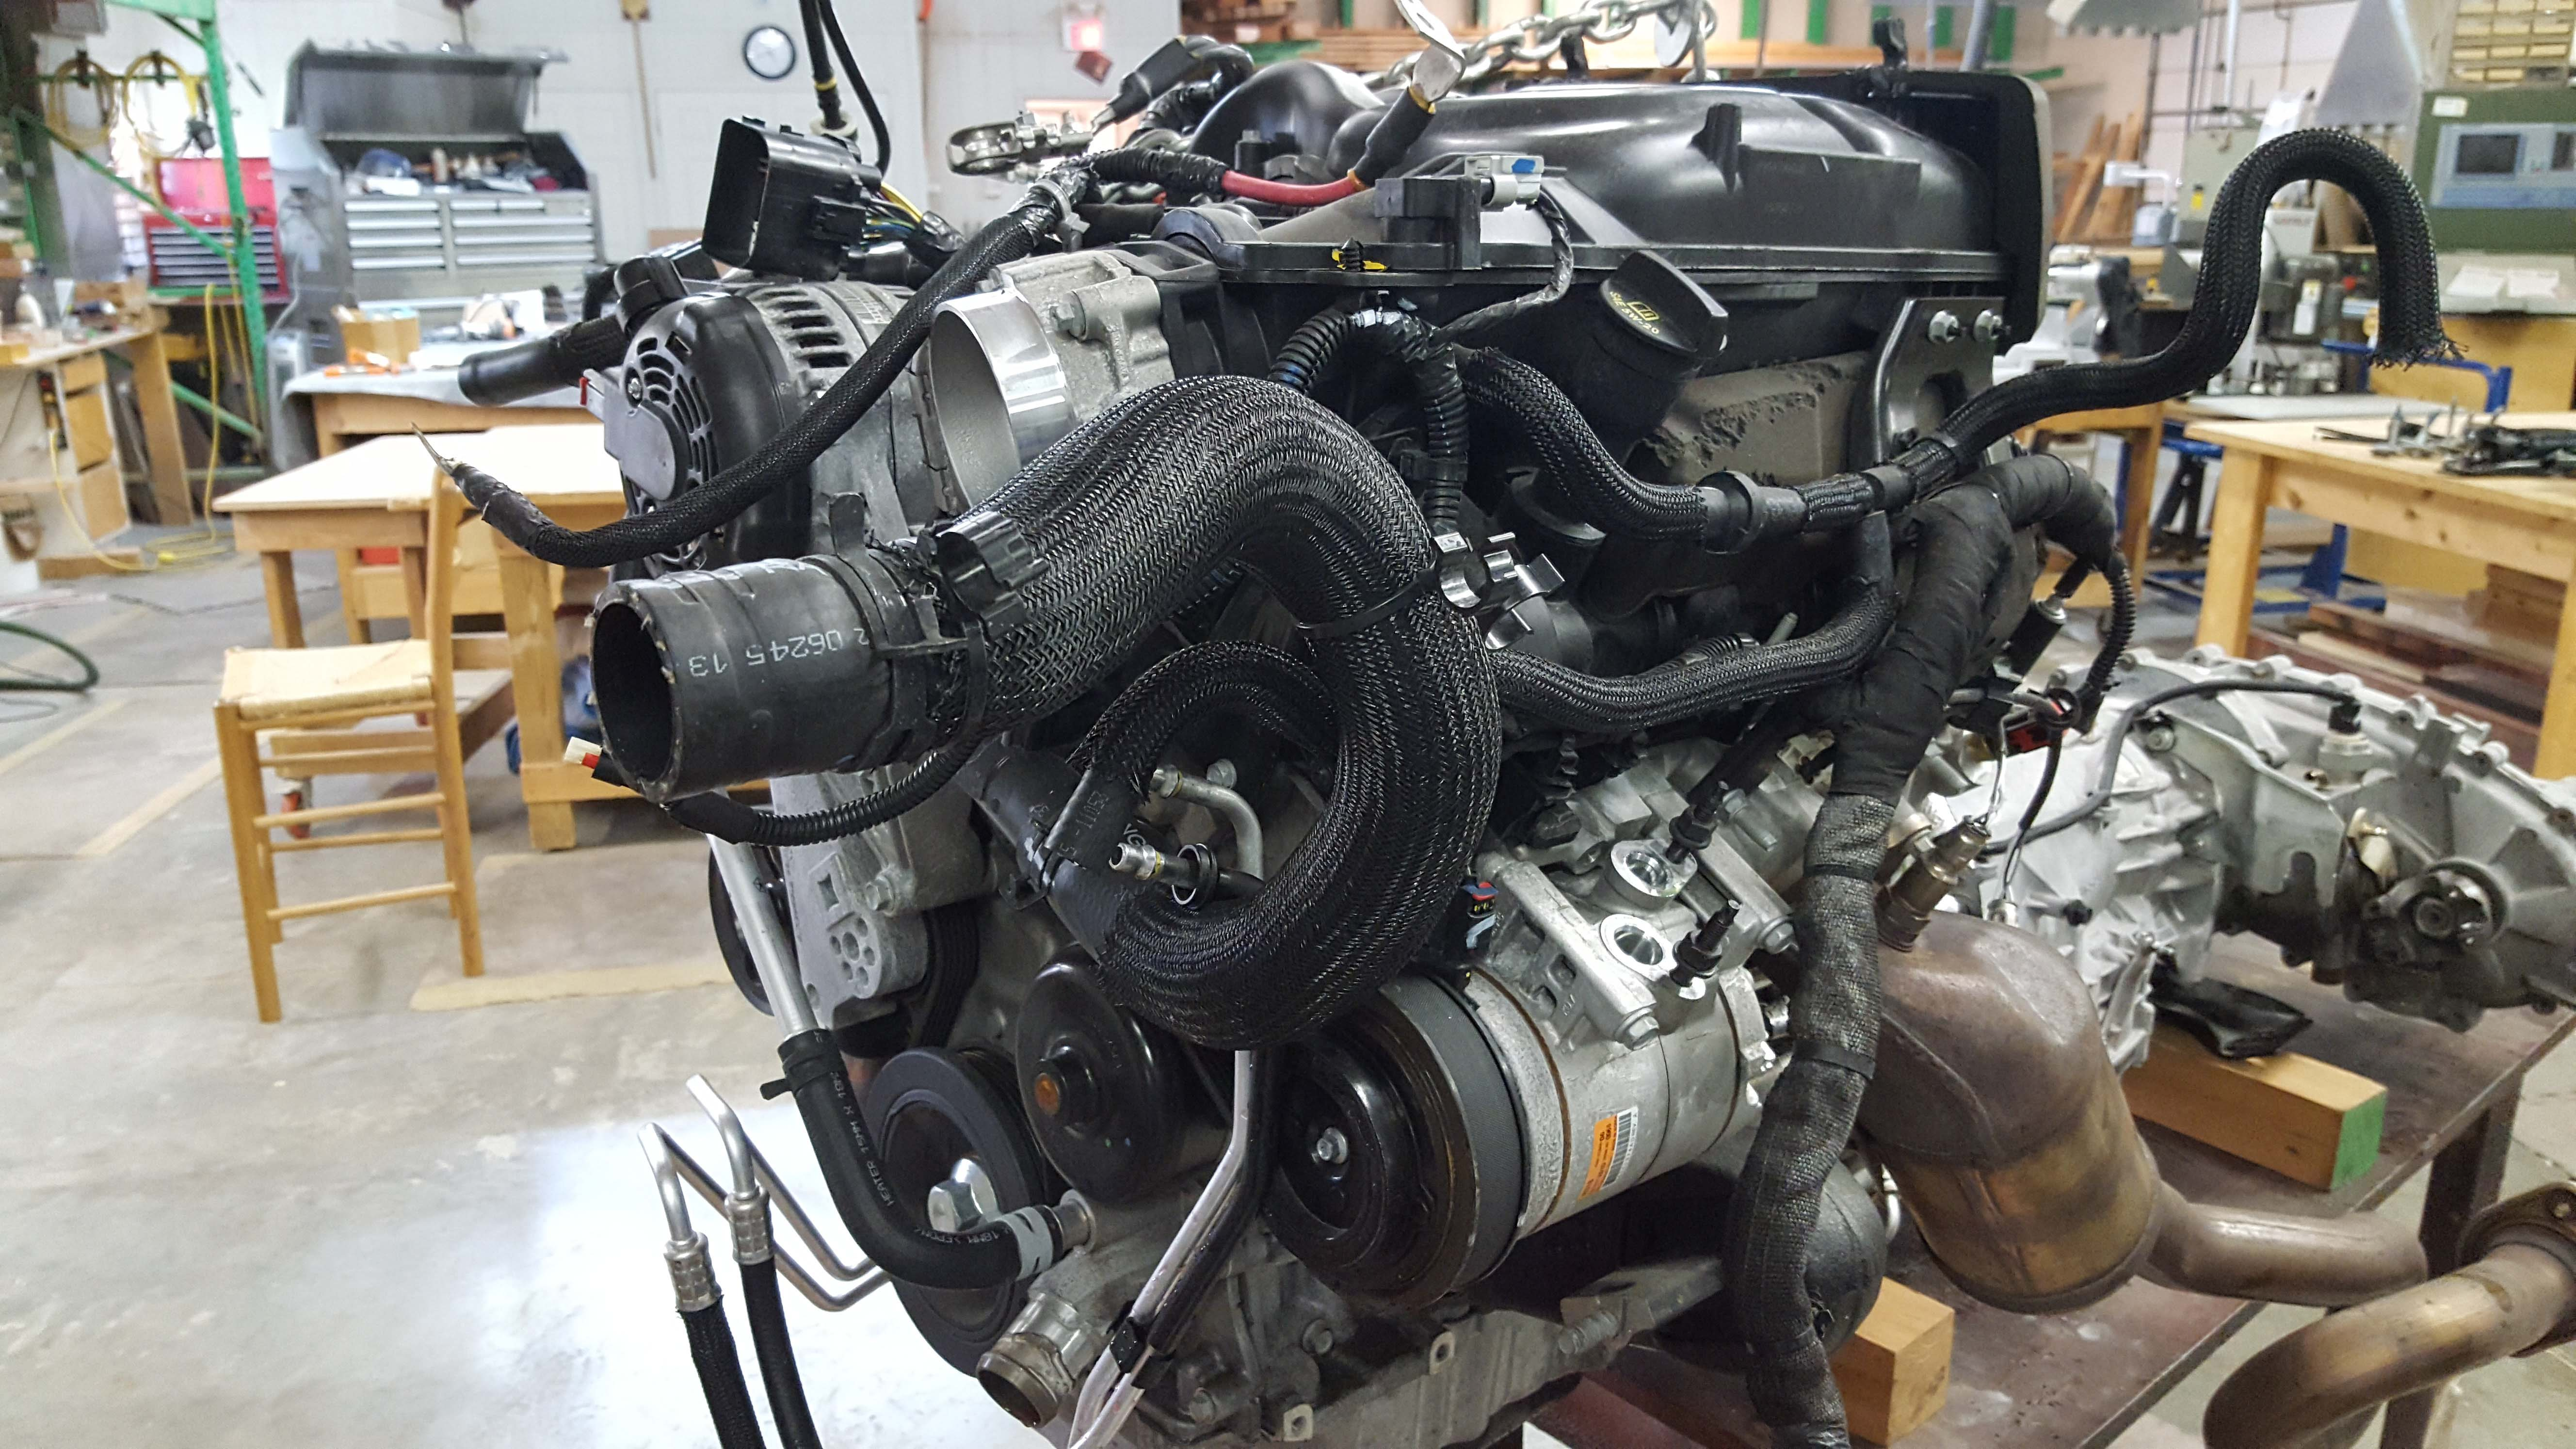 Jk Hemi Conversion Kit Nuthouse Industries Jeeptjsuspensiondiagram Basic Doityourself Jeep Wrangler Front Swap Cincinnati Ohio